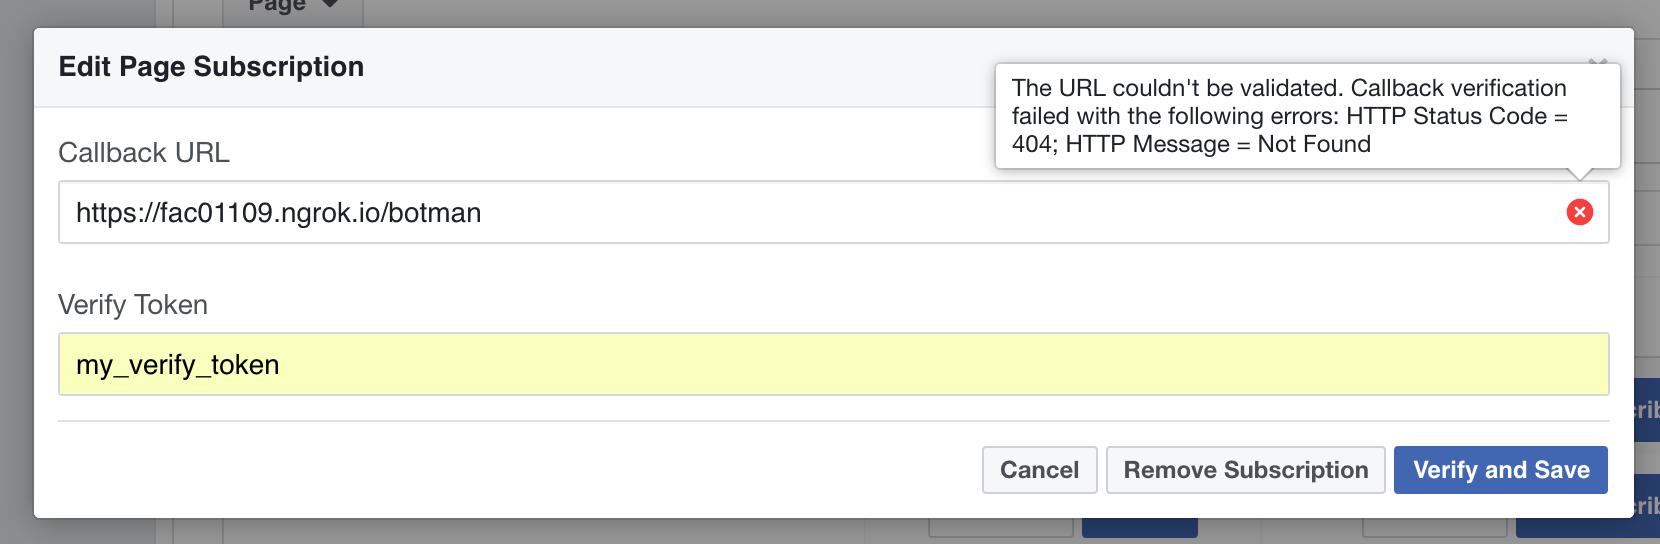 Facebook message error validating verification code